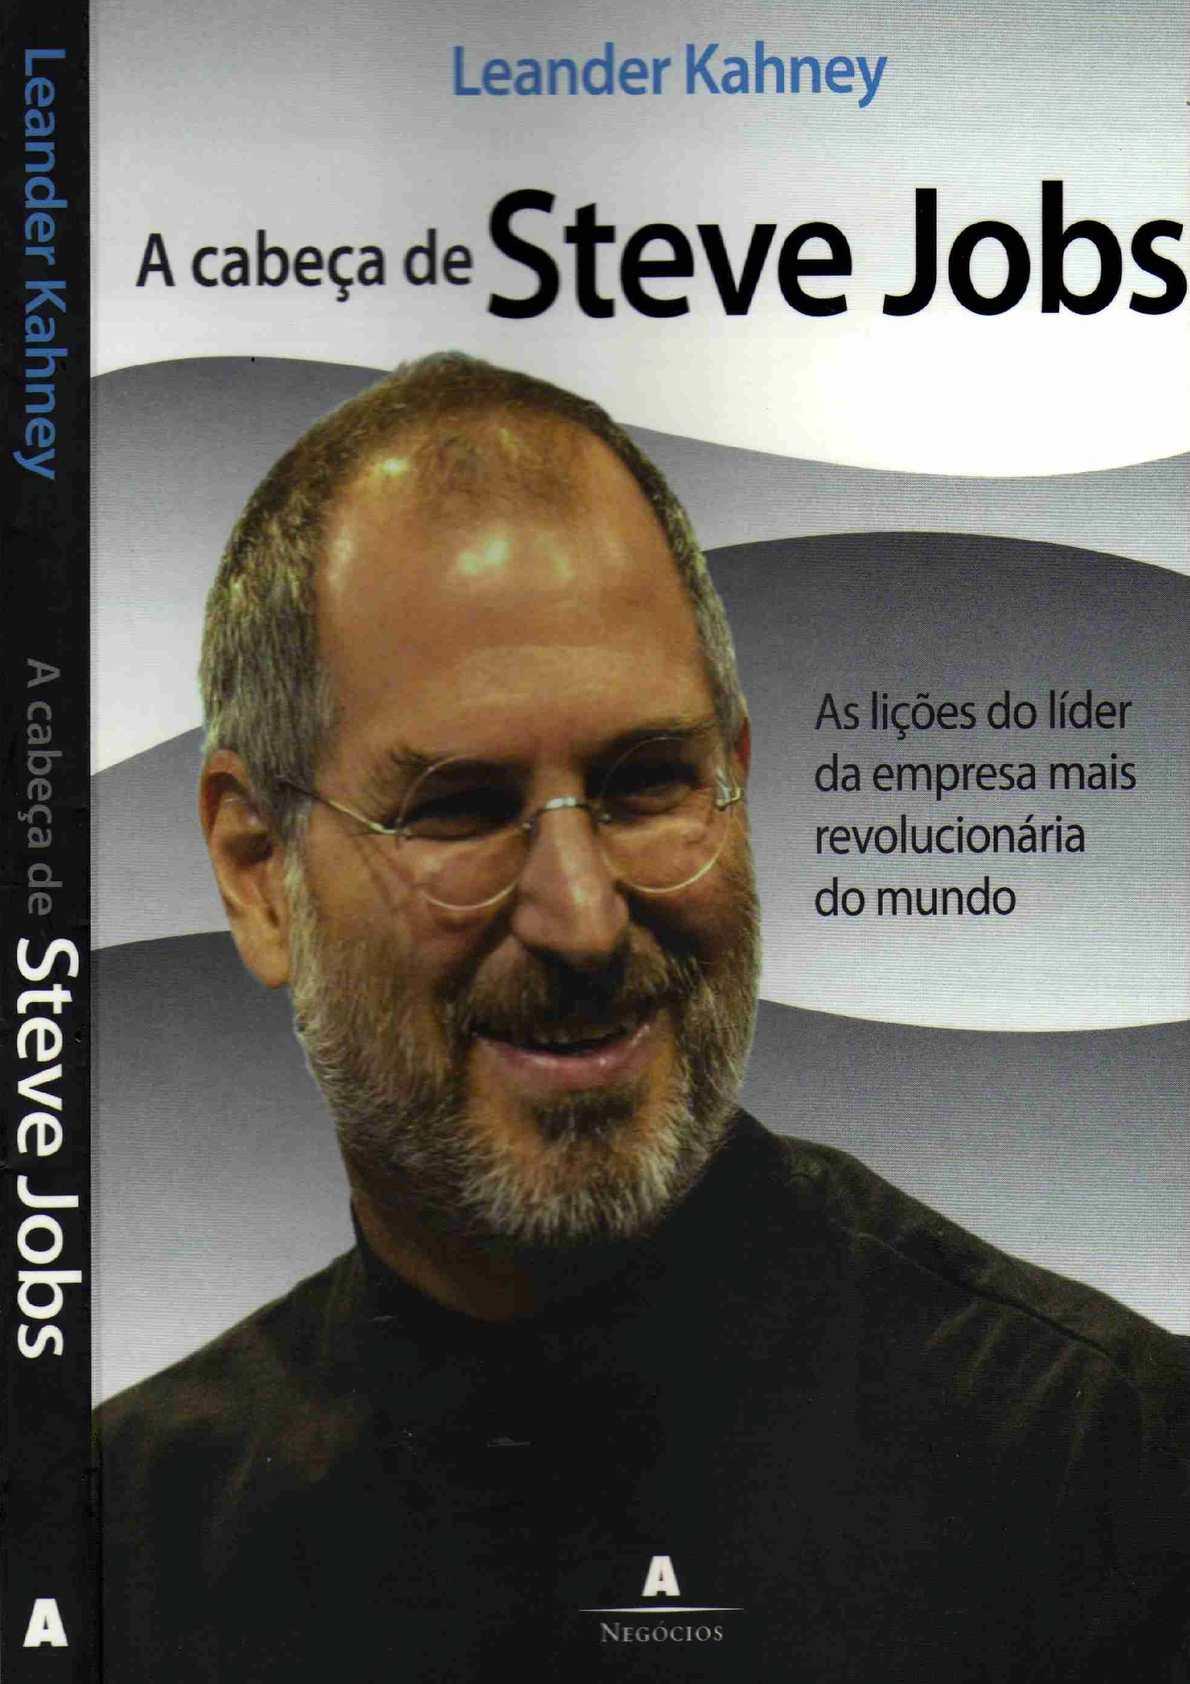 a829328eb8b Calaméo - A Cabeça de Steve Jobs Leander